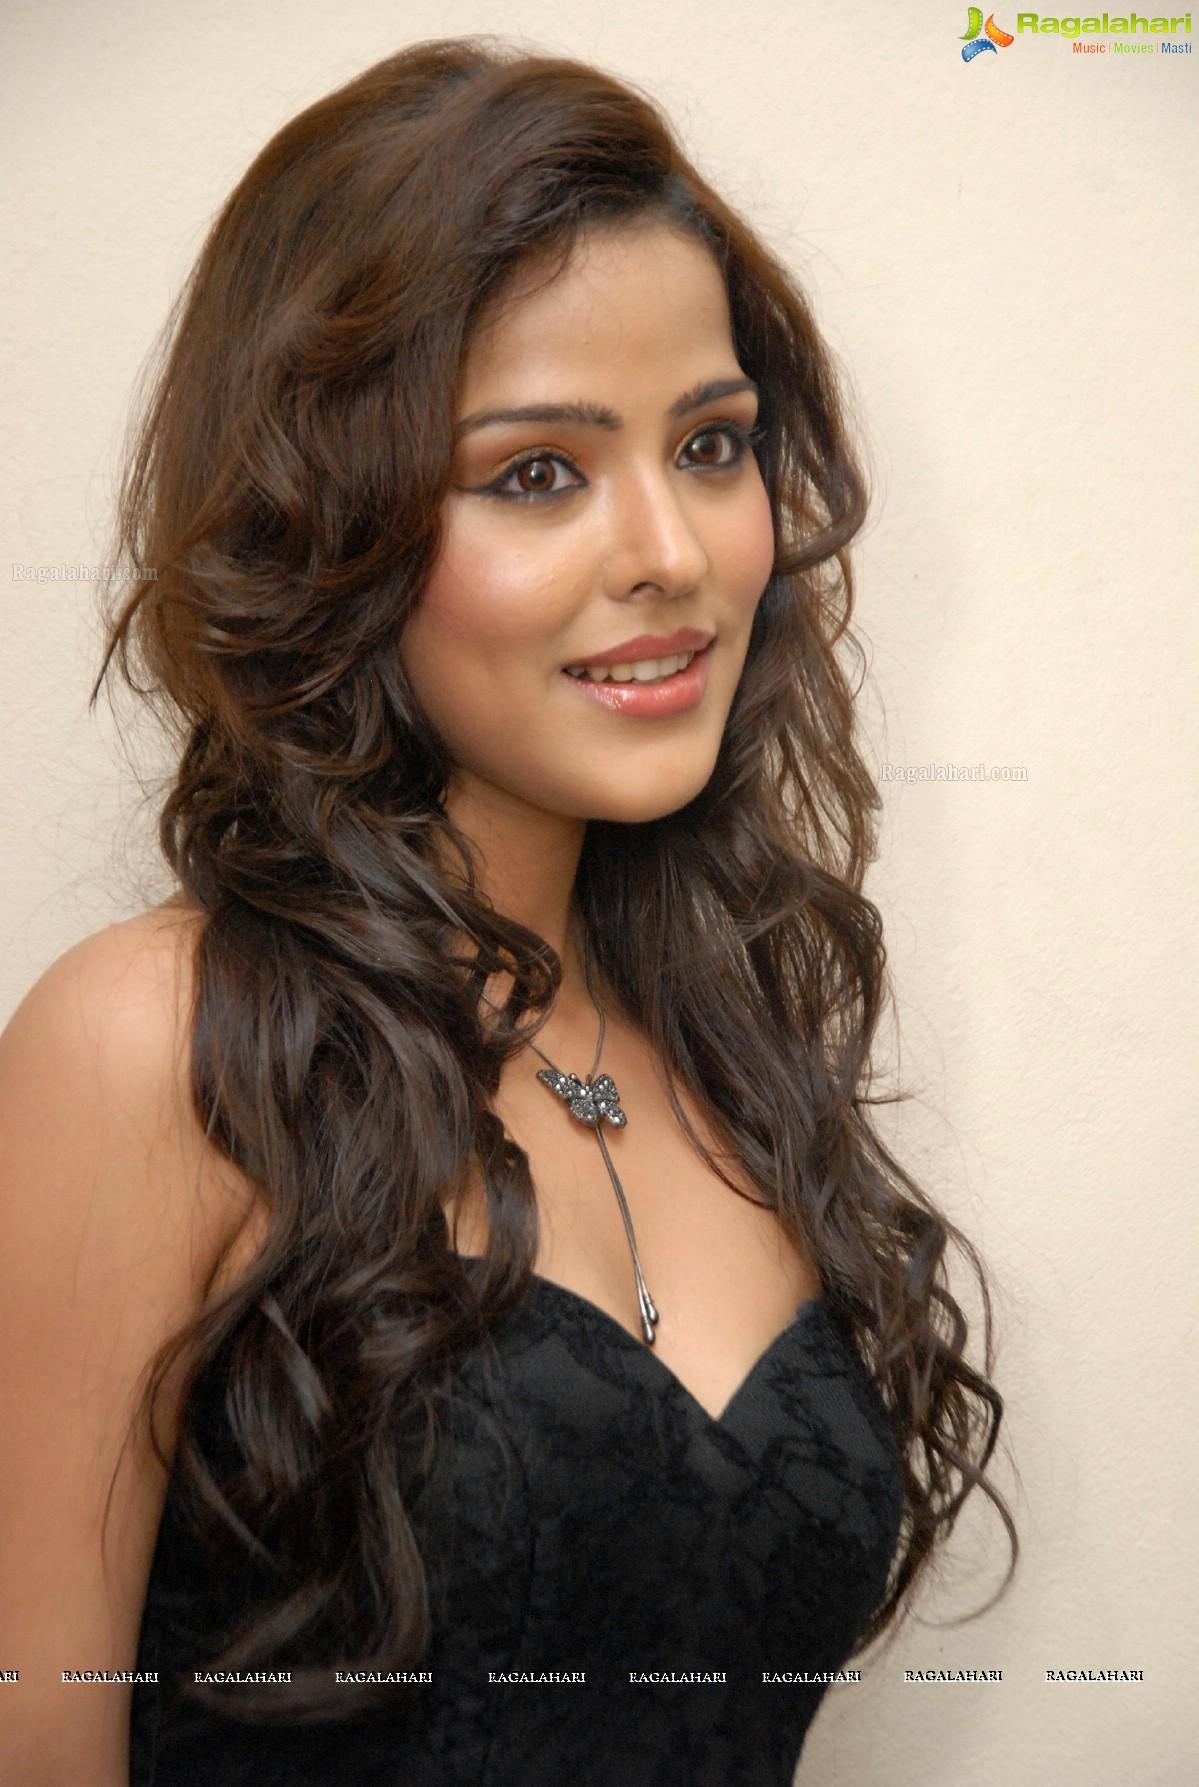 priyanka chabra image 53 | telugu heroines stills,images, photos